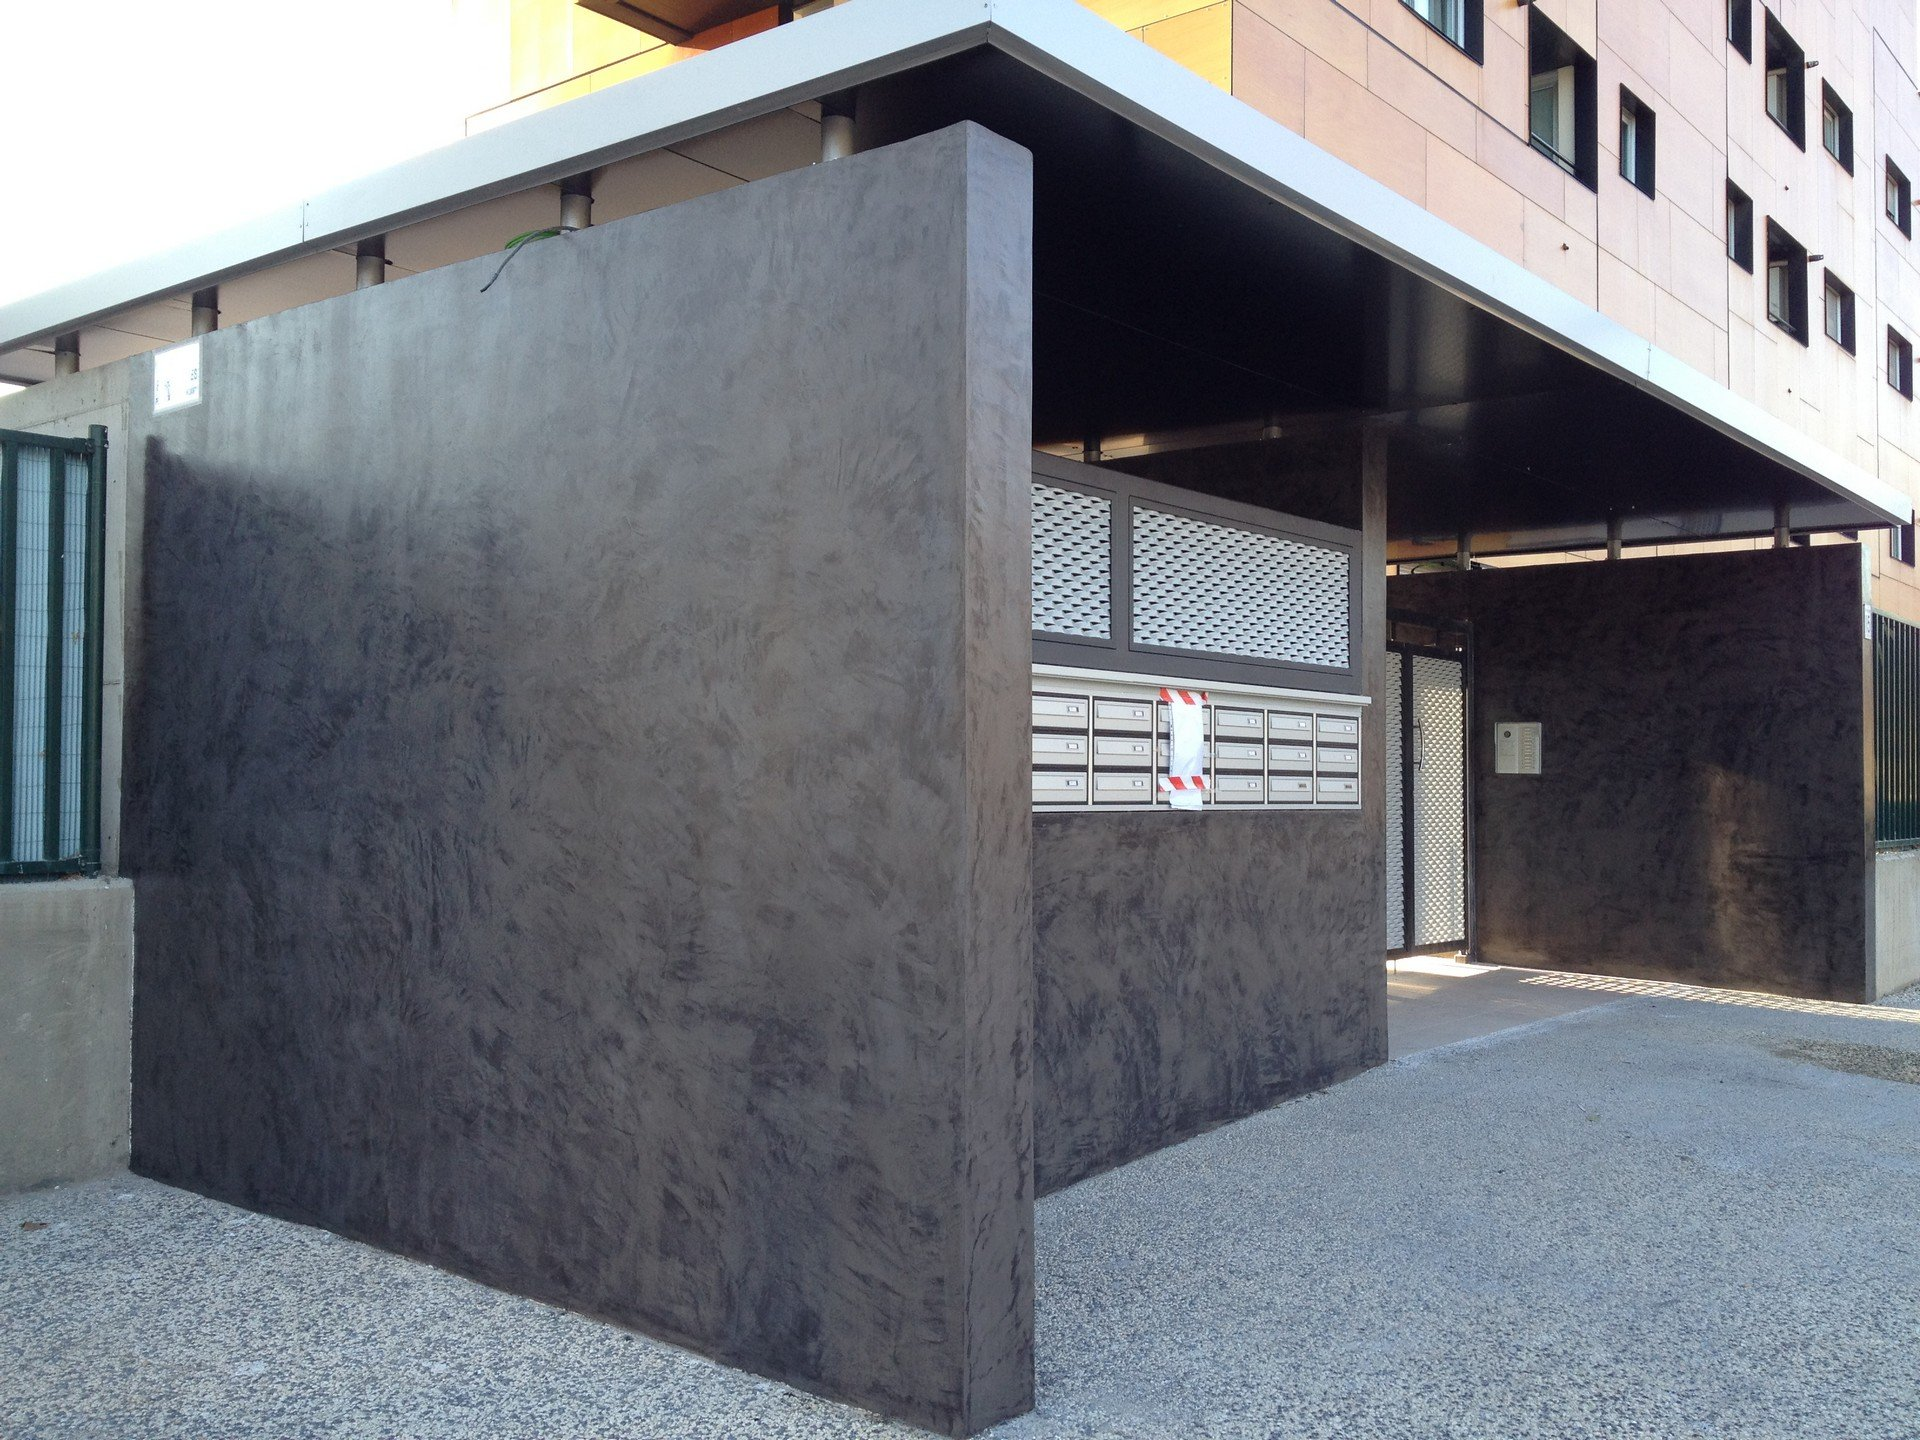 Microcemento para exteriores revestimientos de exterior - Revestimientos de exteriores ...